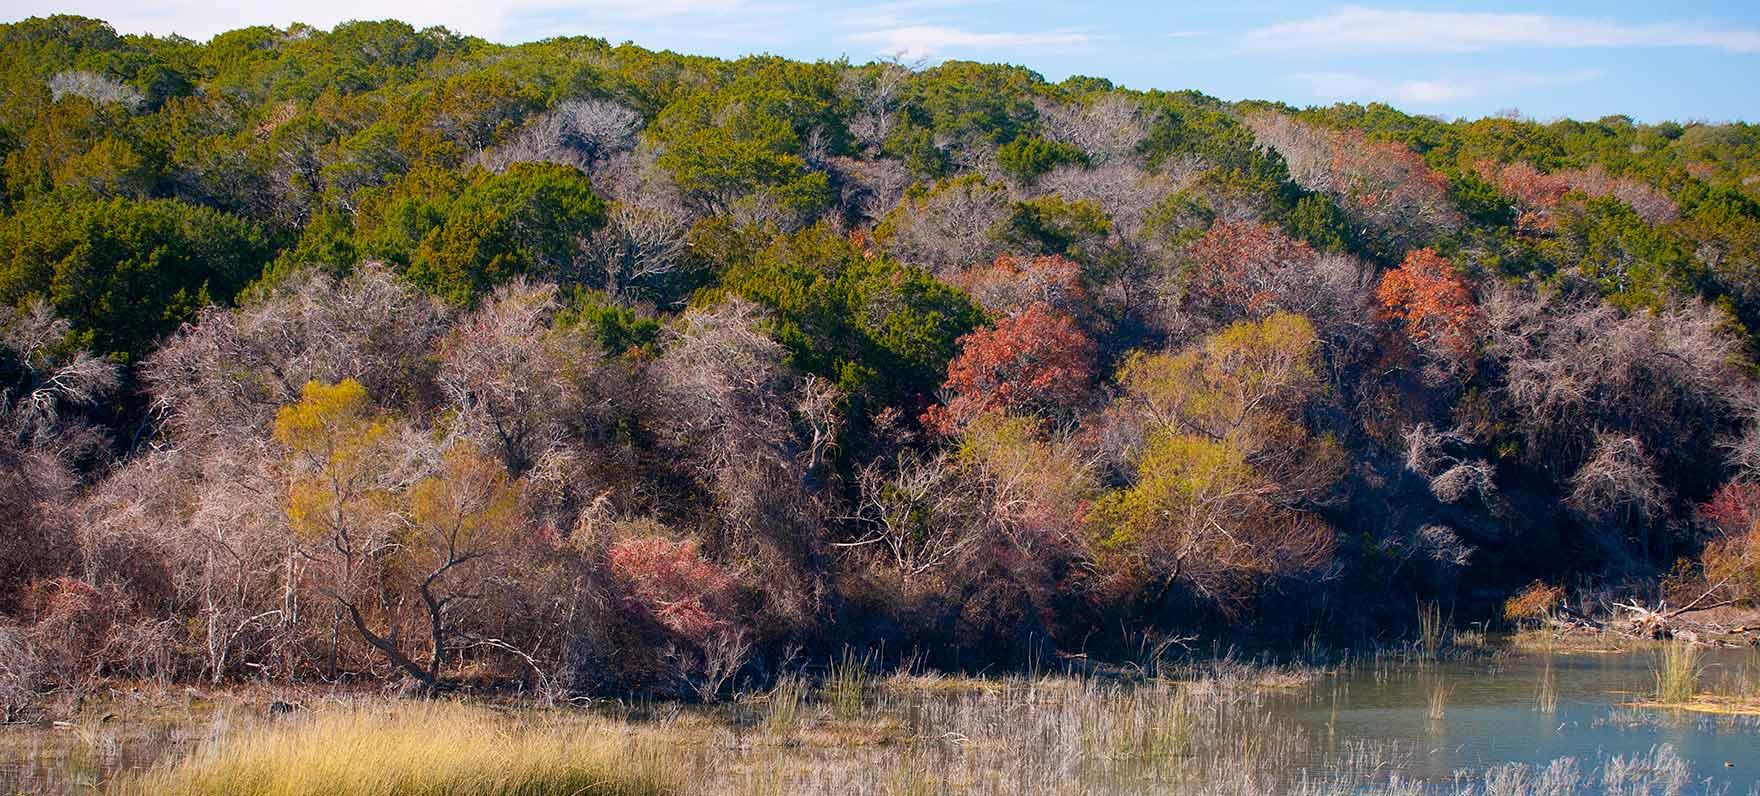 meridian state park  u2014 texas parks  u0026 wildlife department